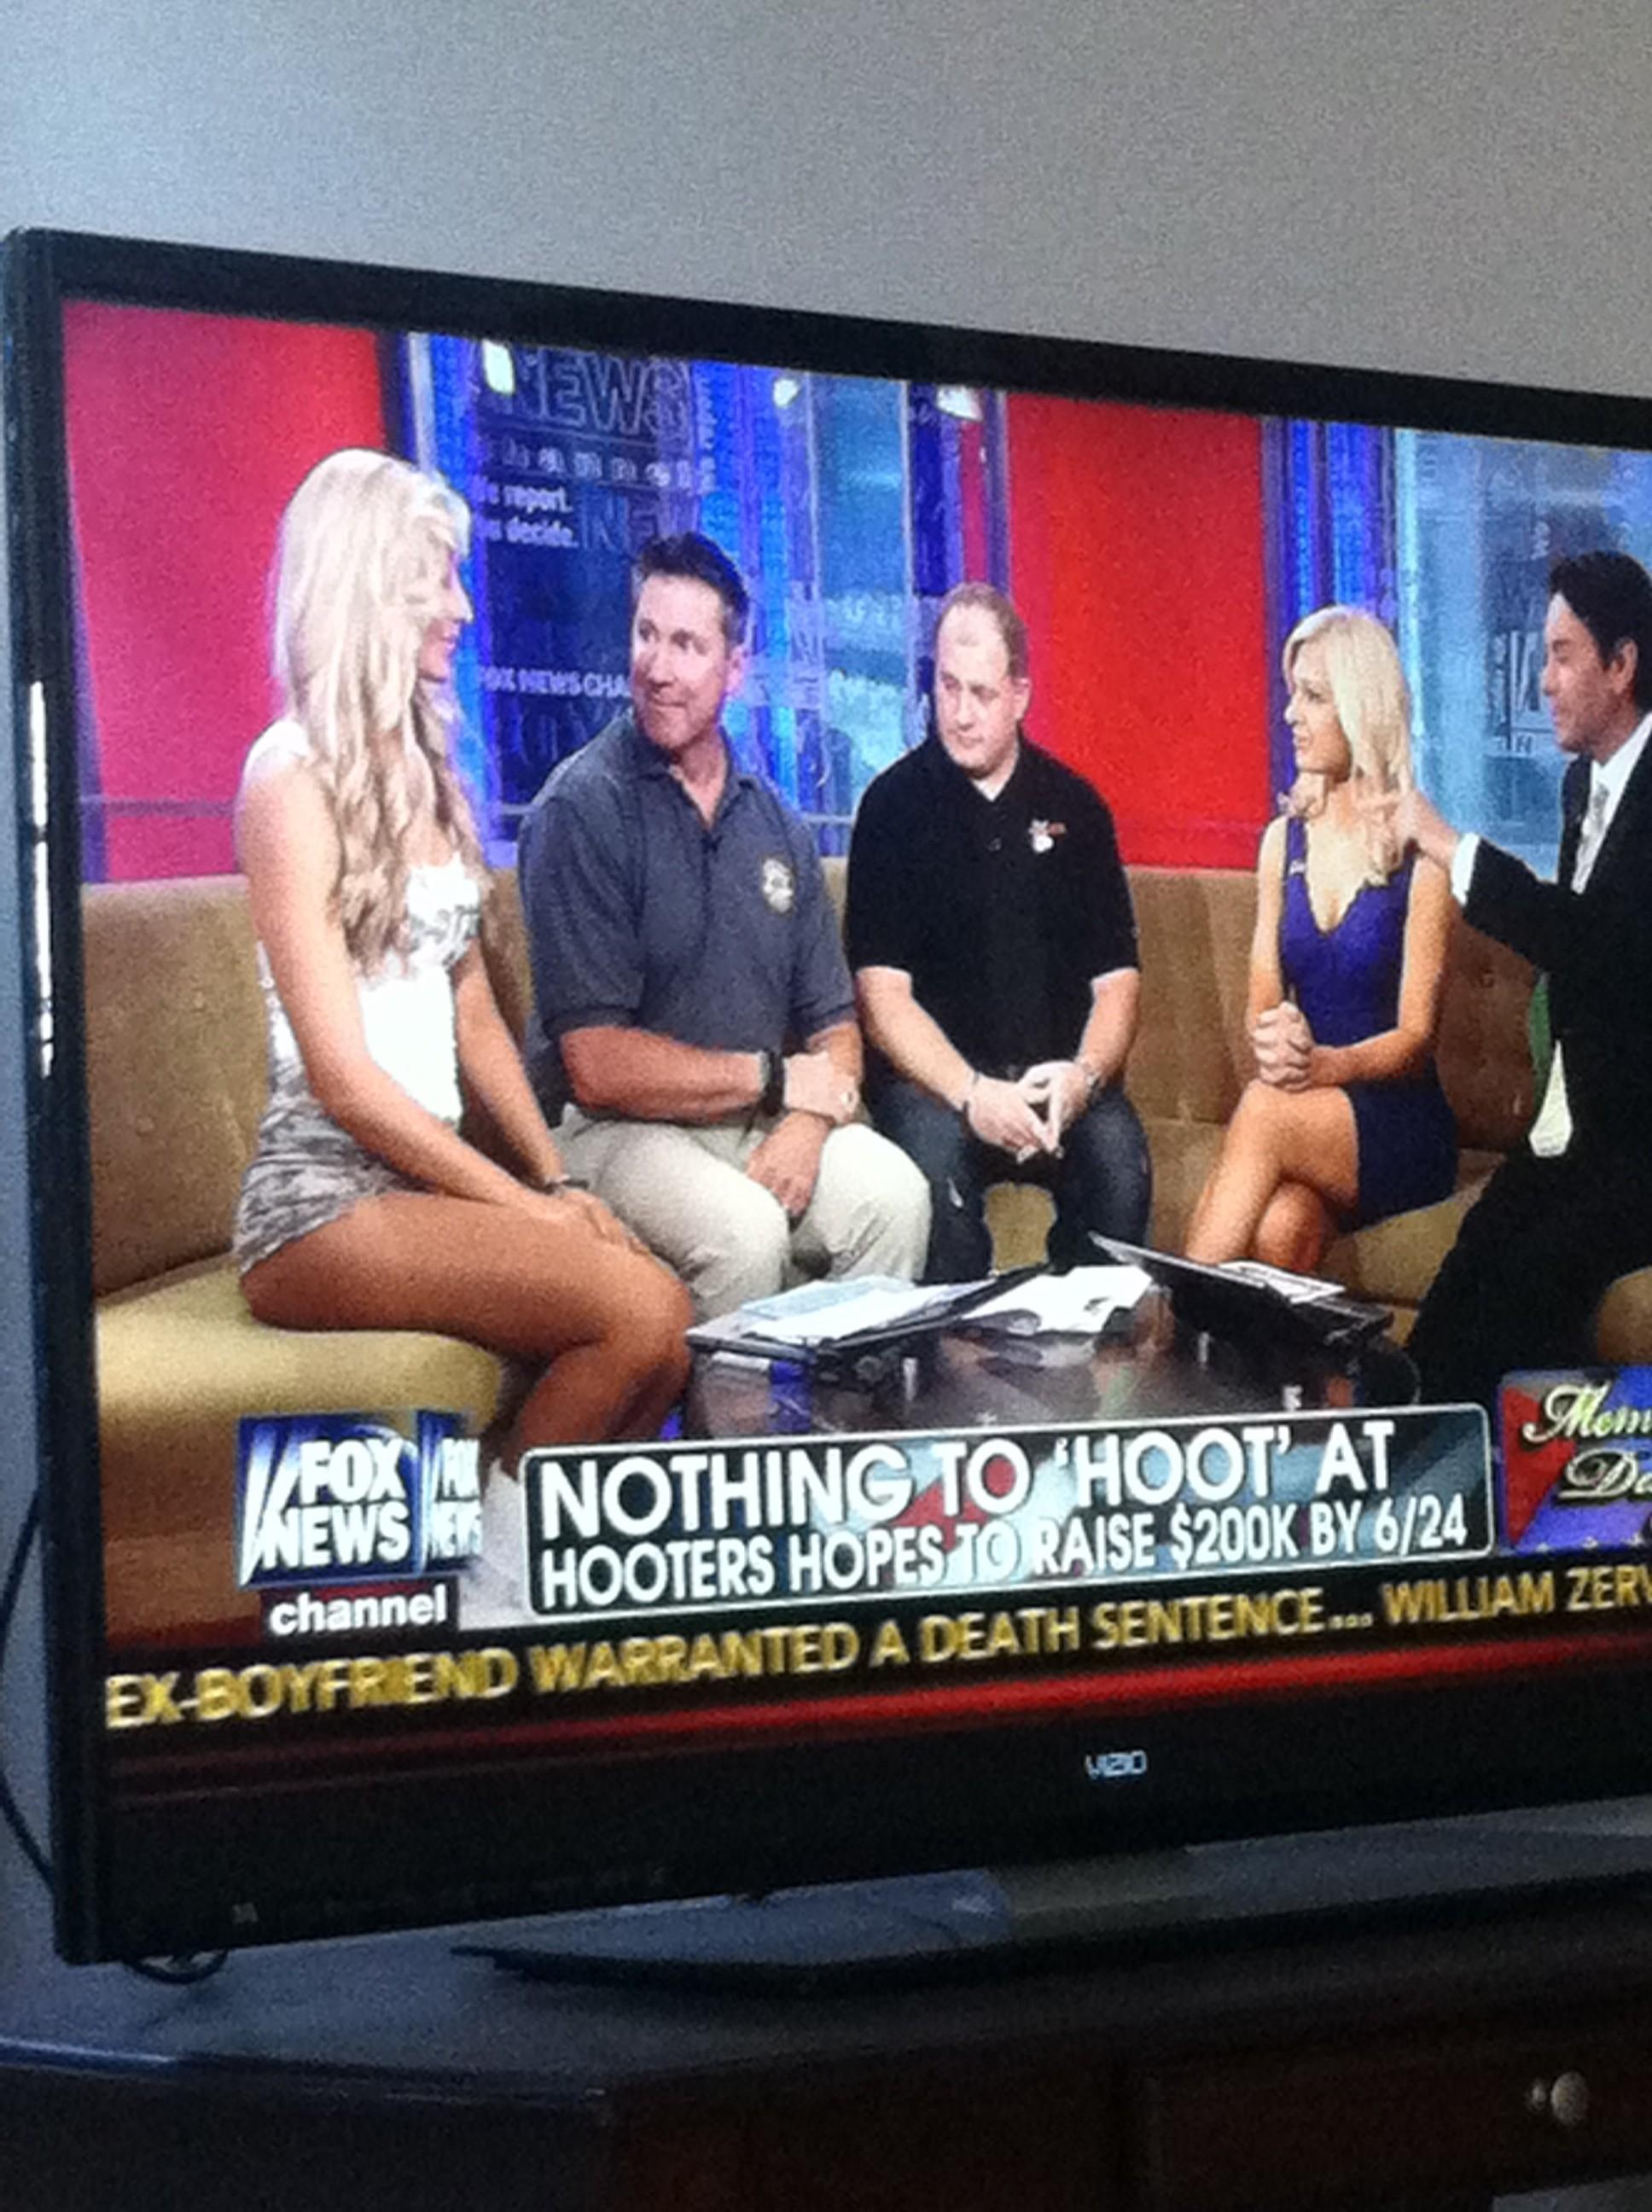 Shameless staring on Fox News. TFM.